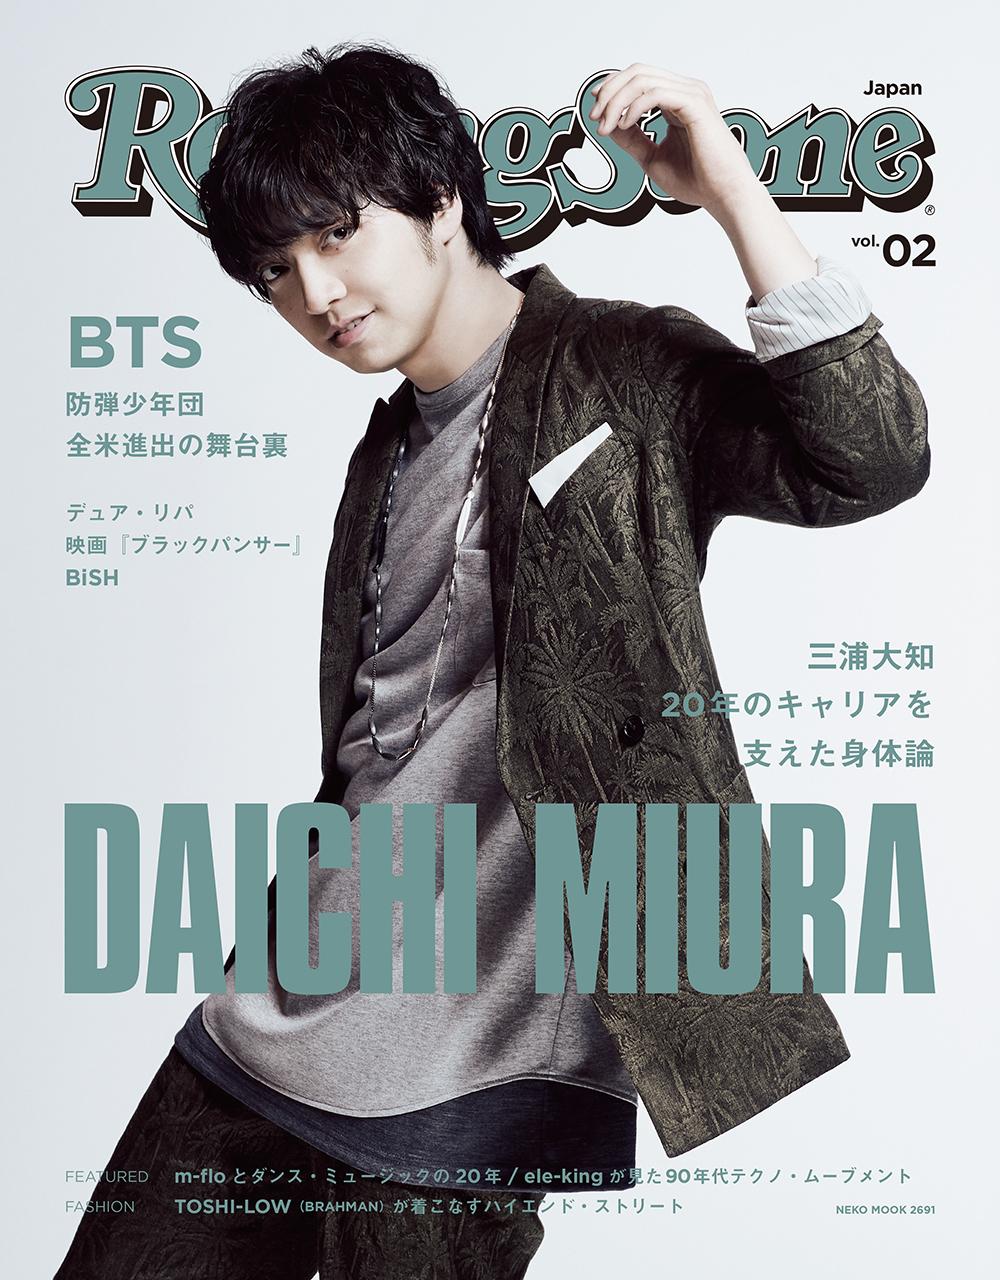 Rolling Stone Japan vol.02